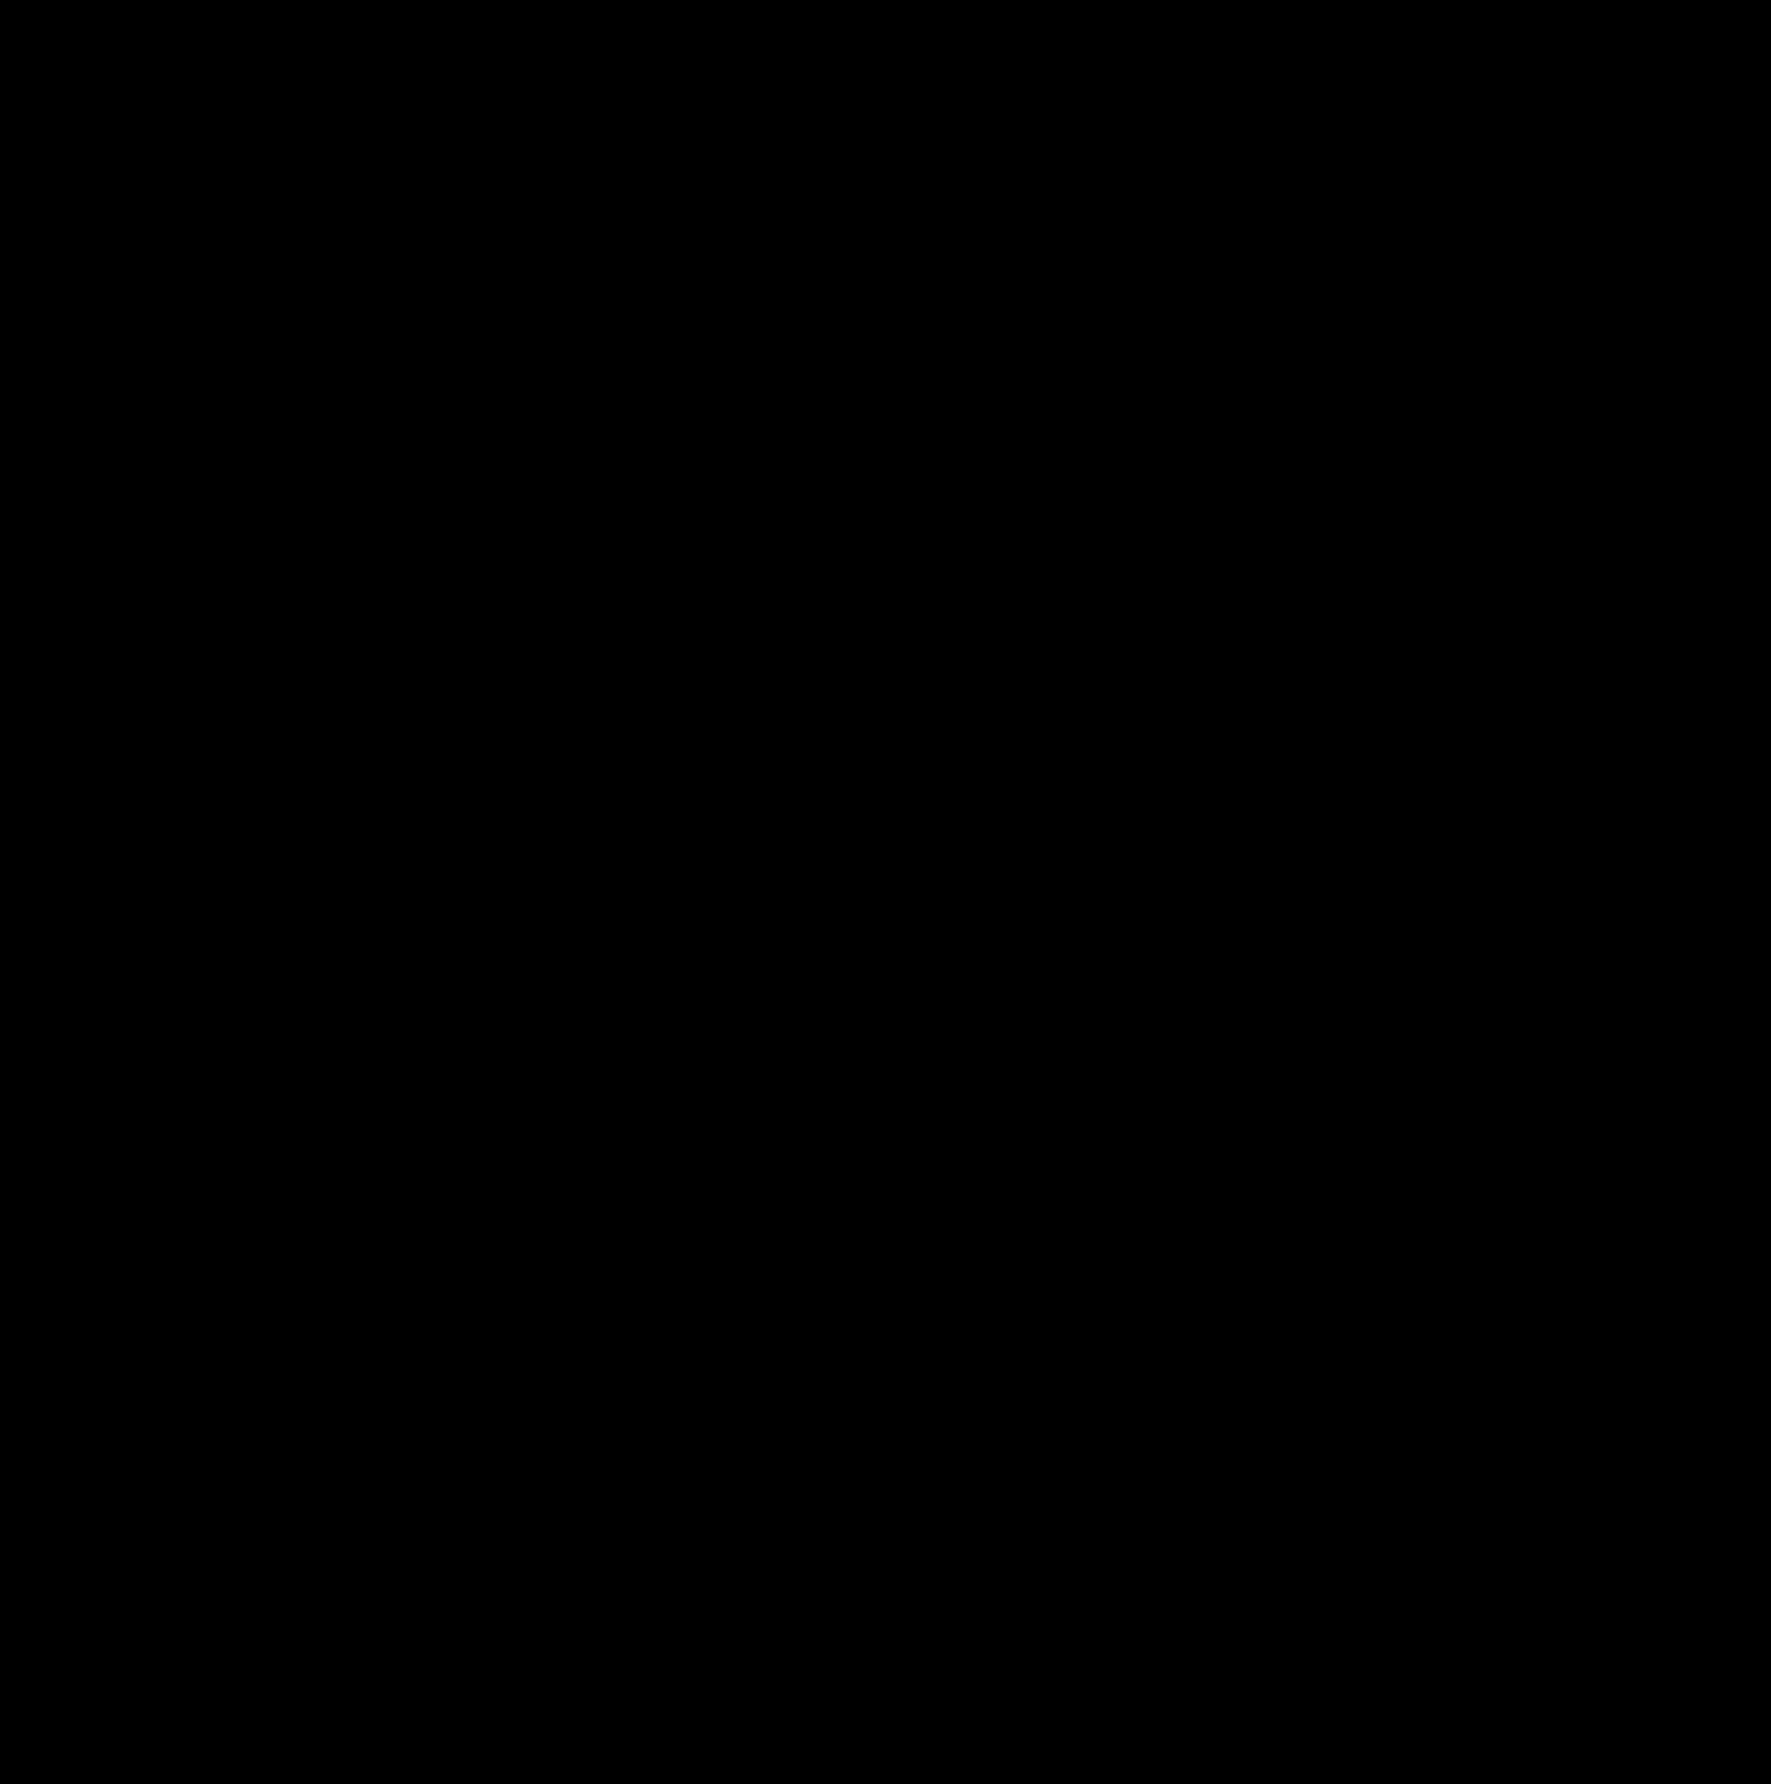 1. BSV Logo